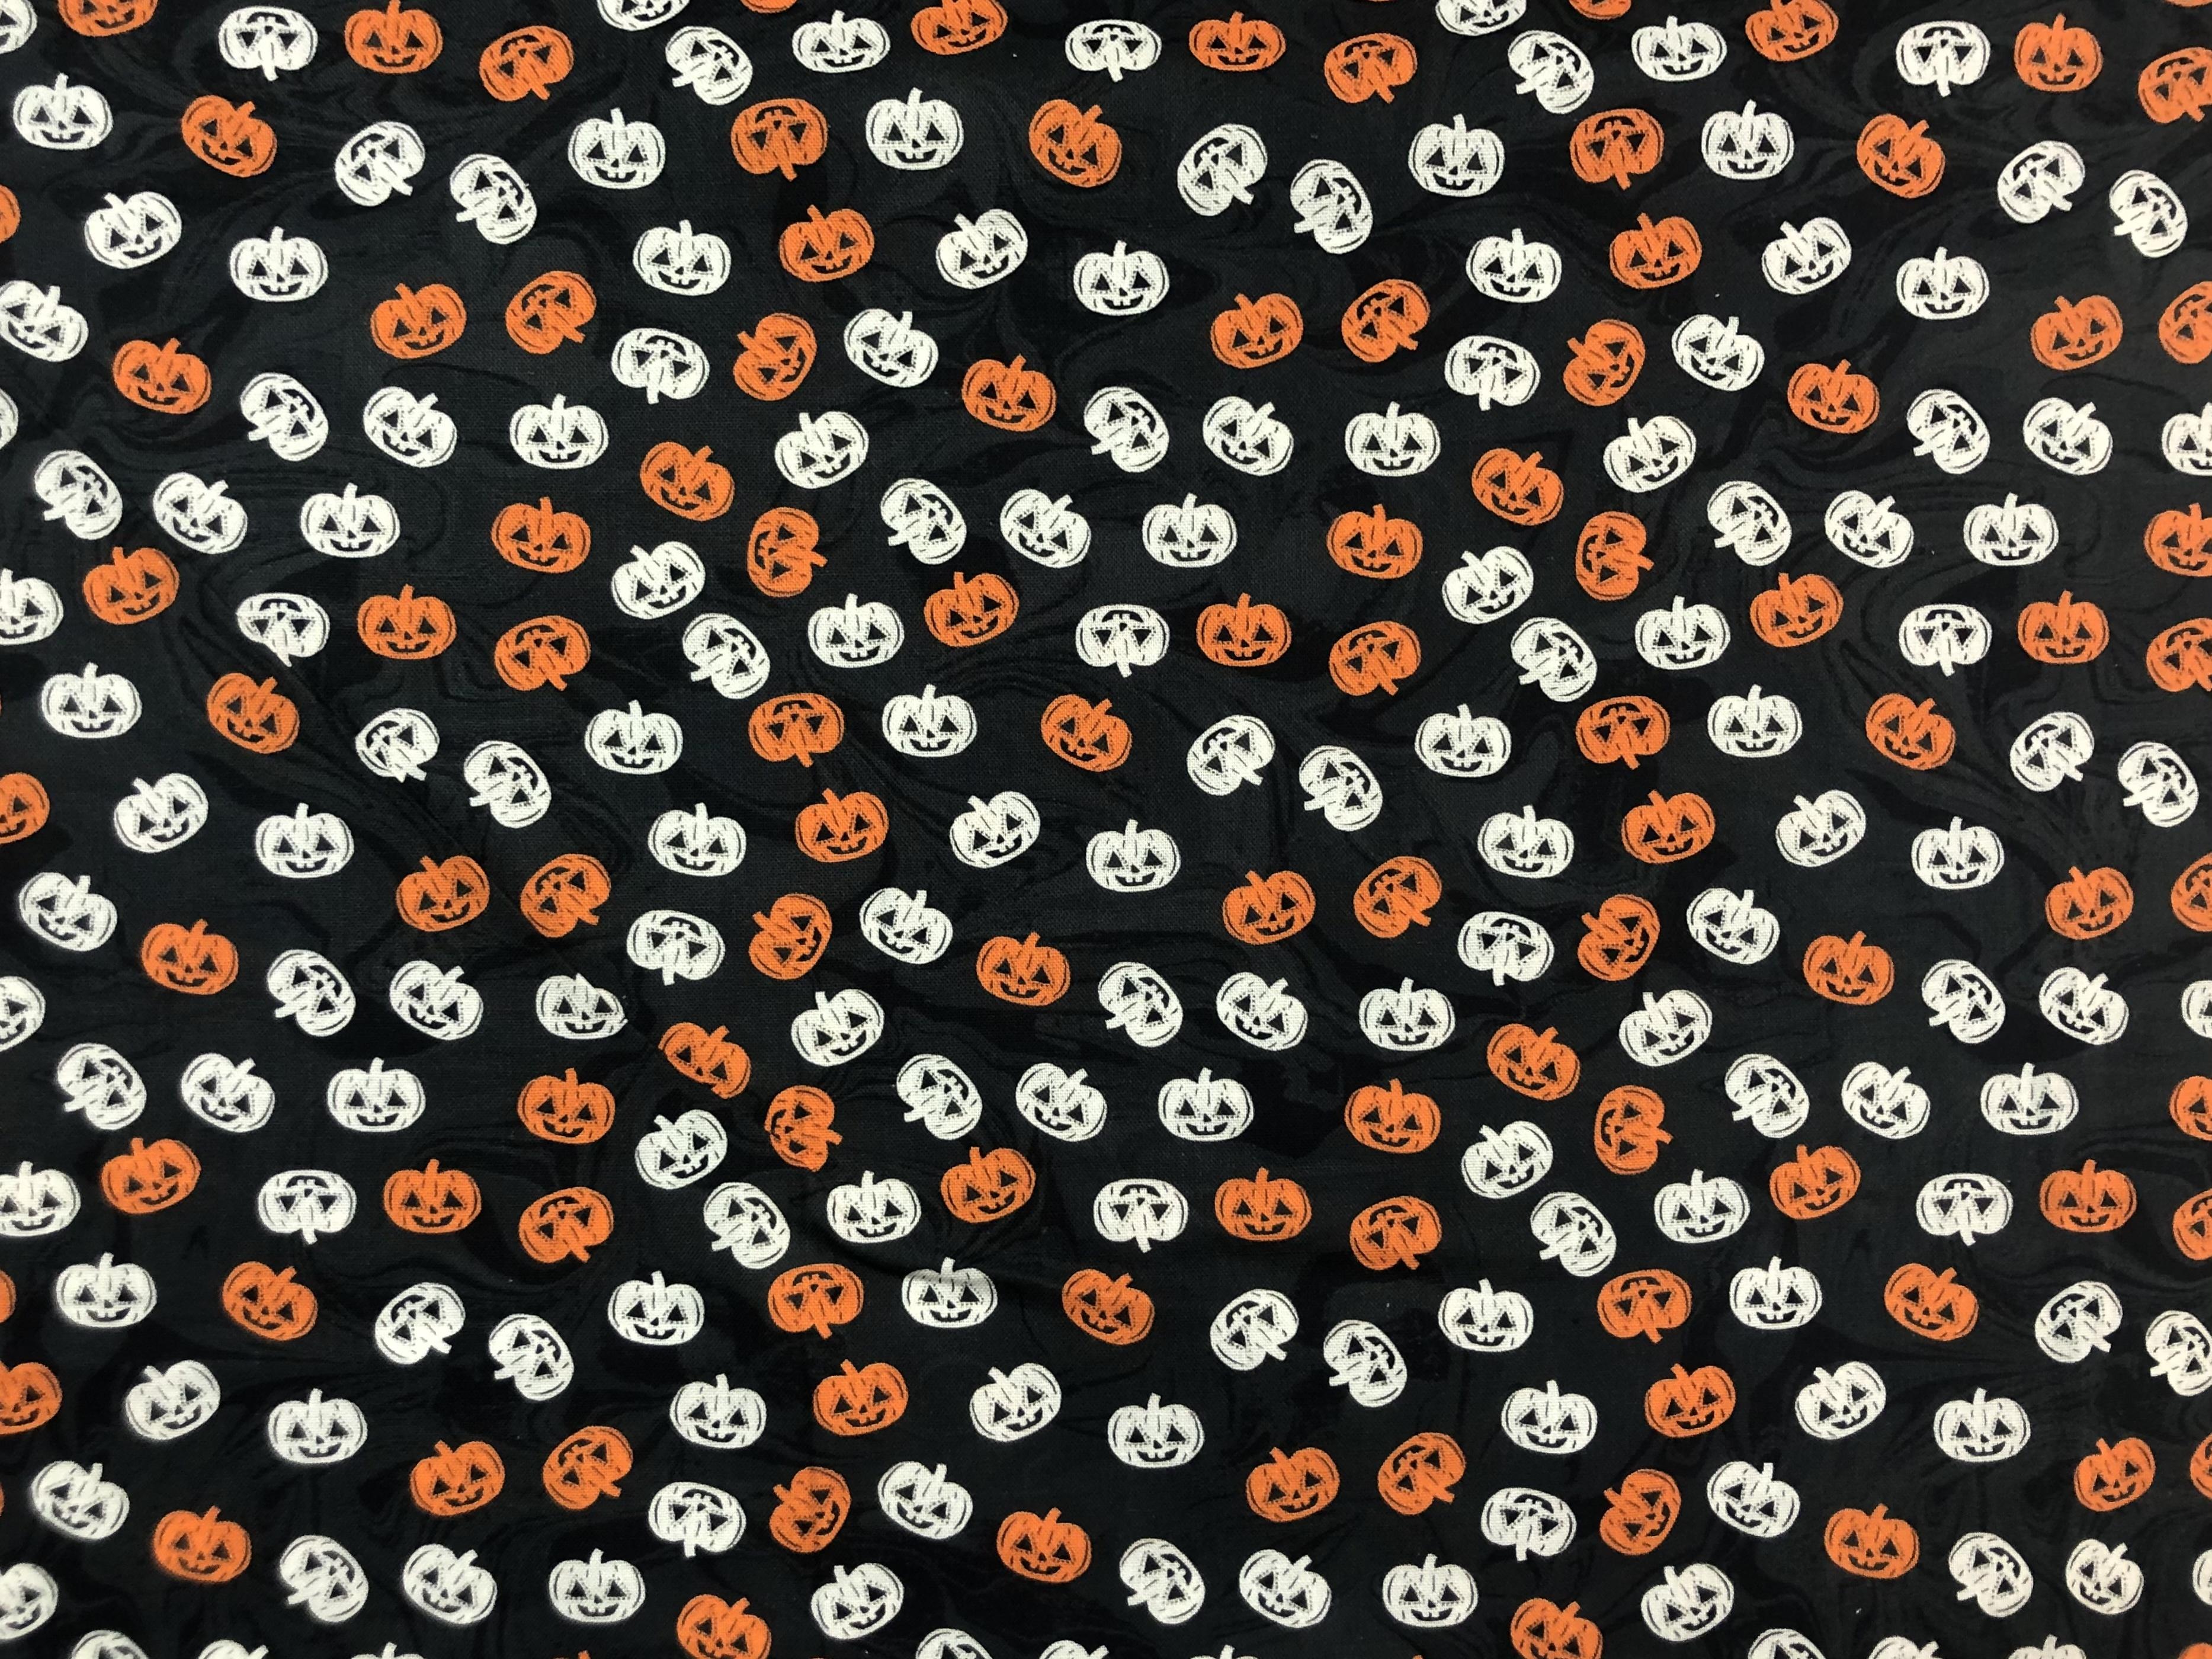 Orange and White Pumpkins - 1/2m cut 57766